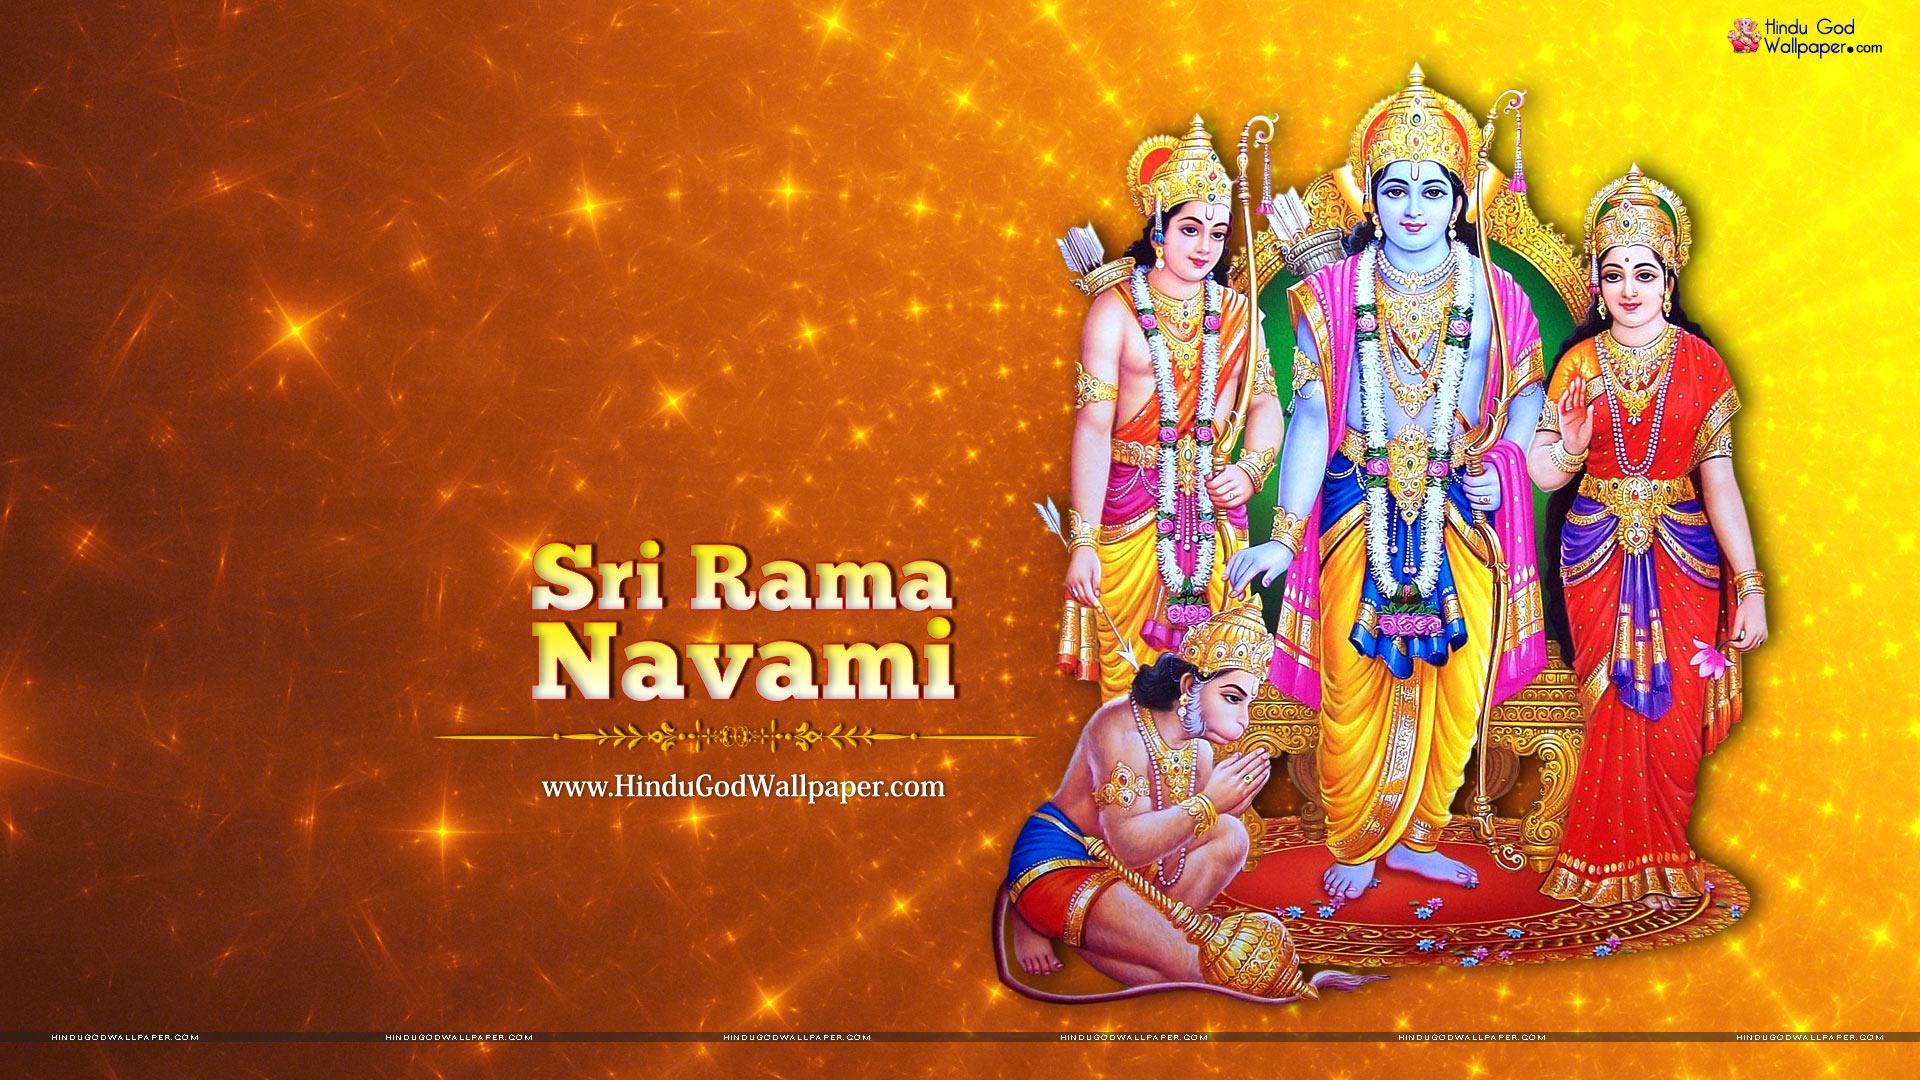 Ram Navami 2018 Hd Wallpapers Images Photos Free Download